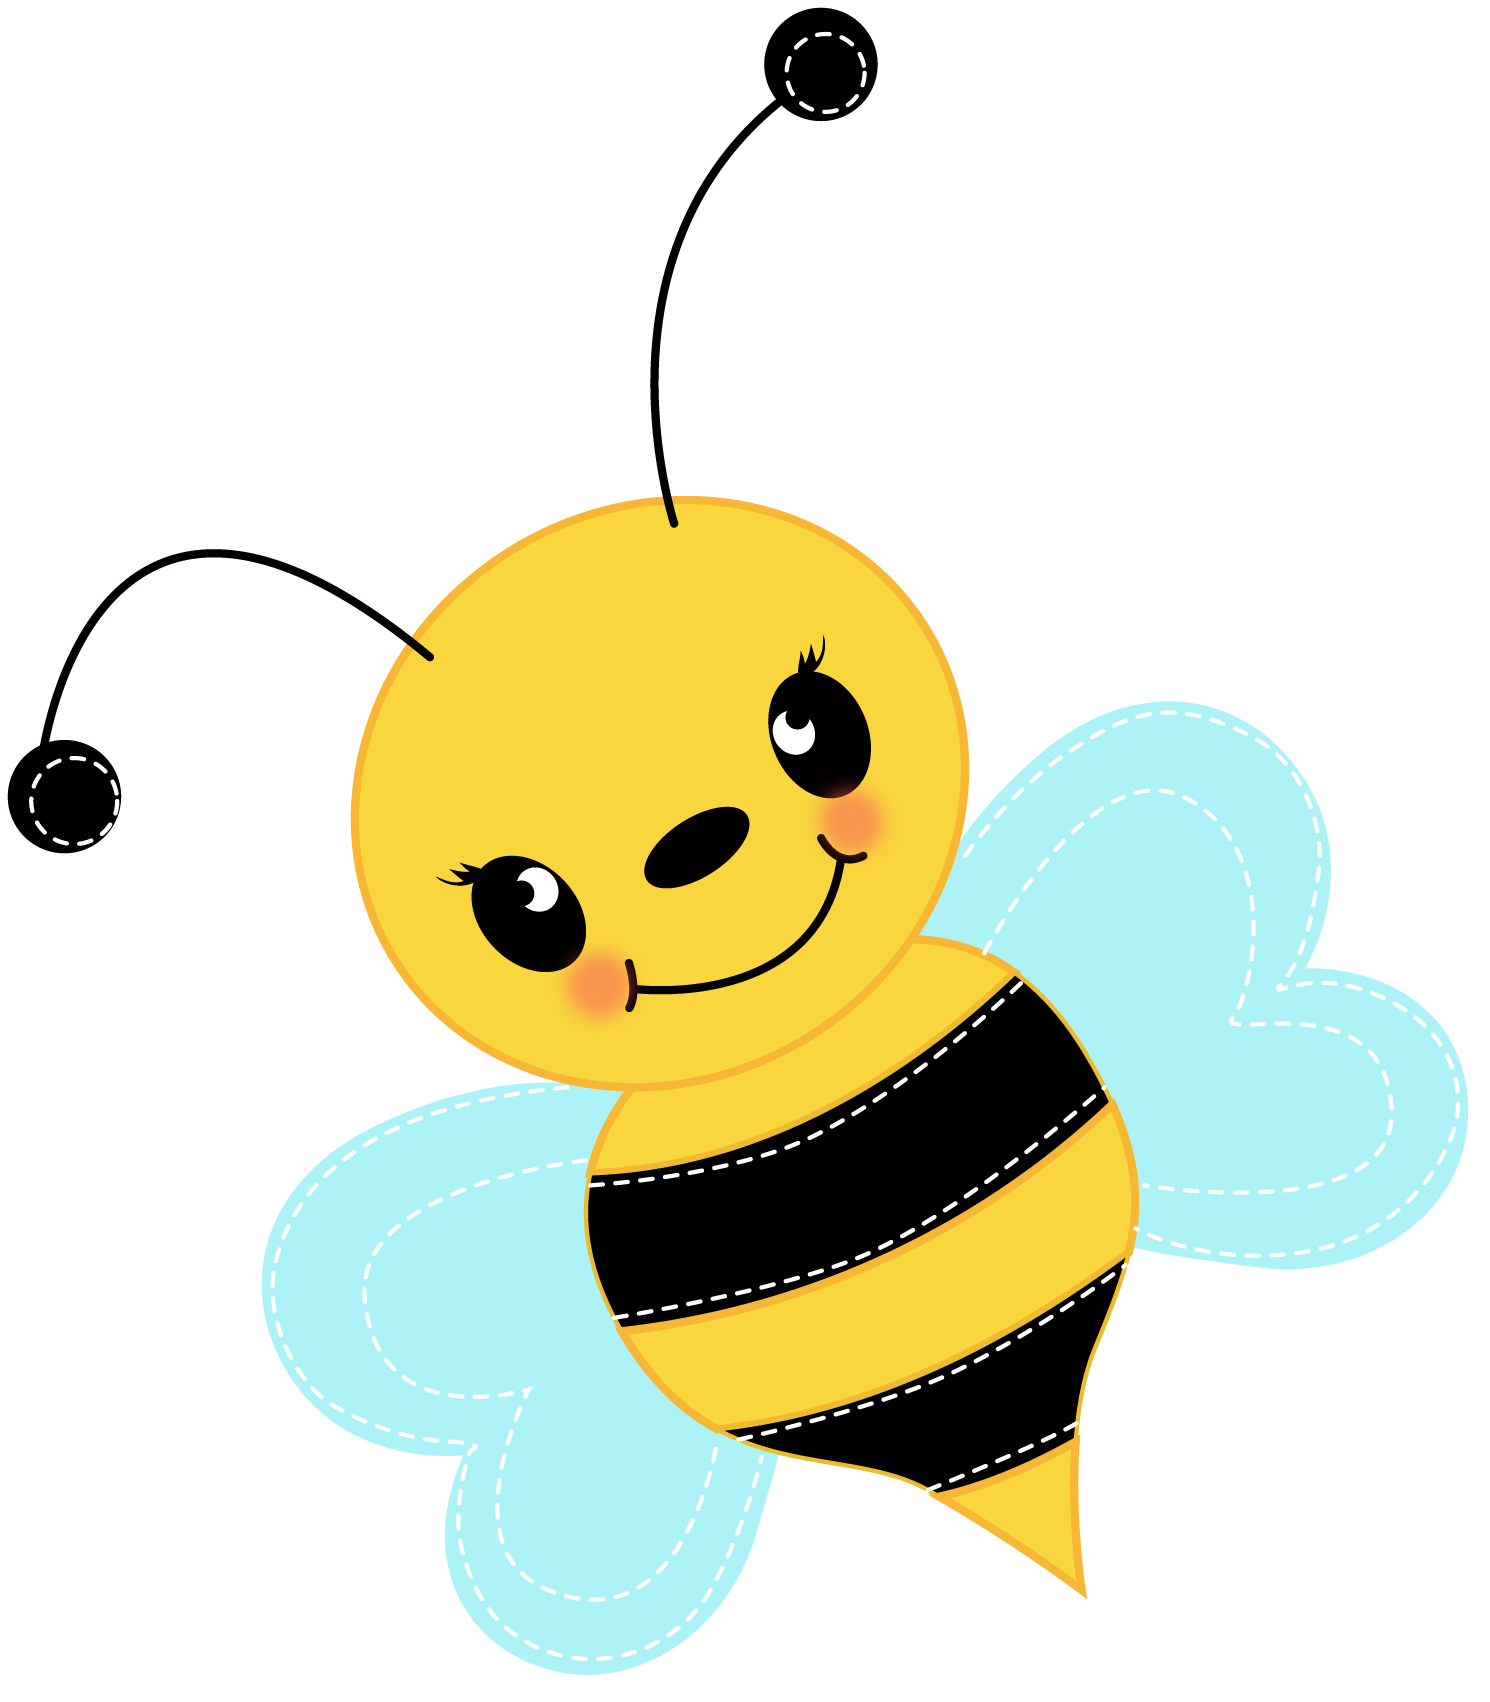 Free PNG Honey Bee - 47275